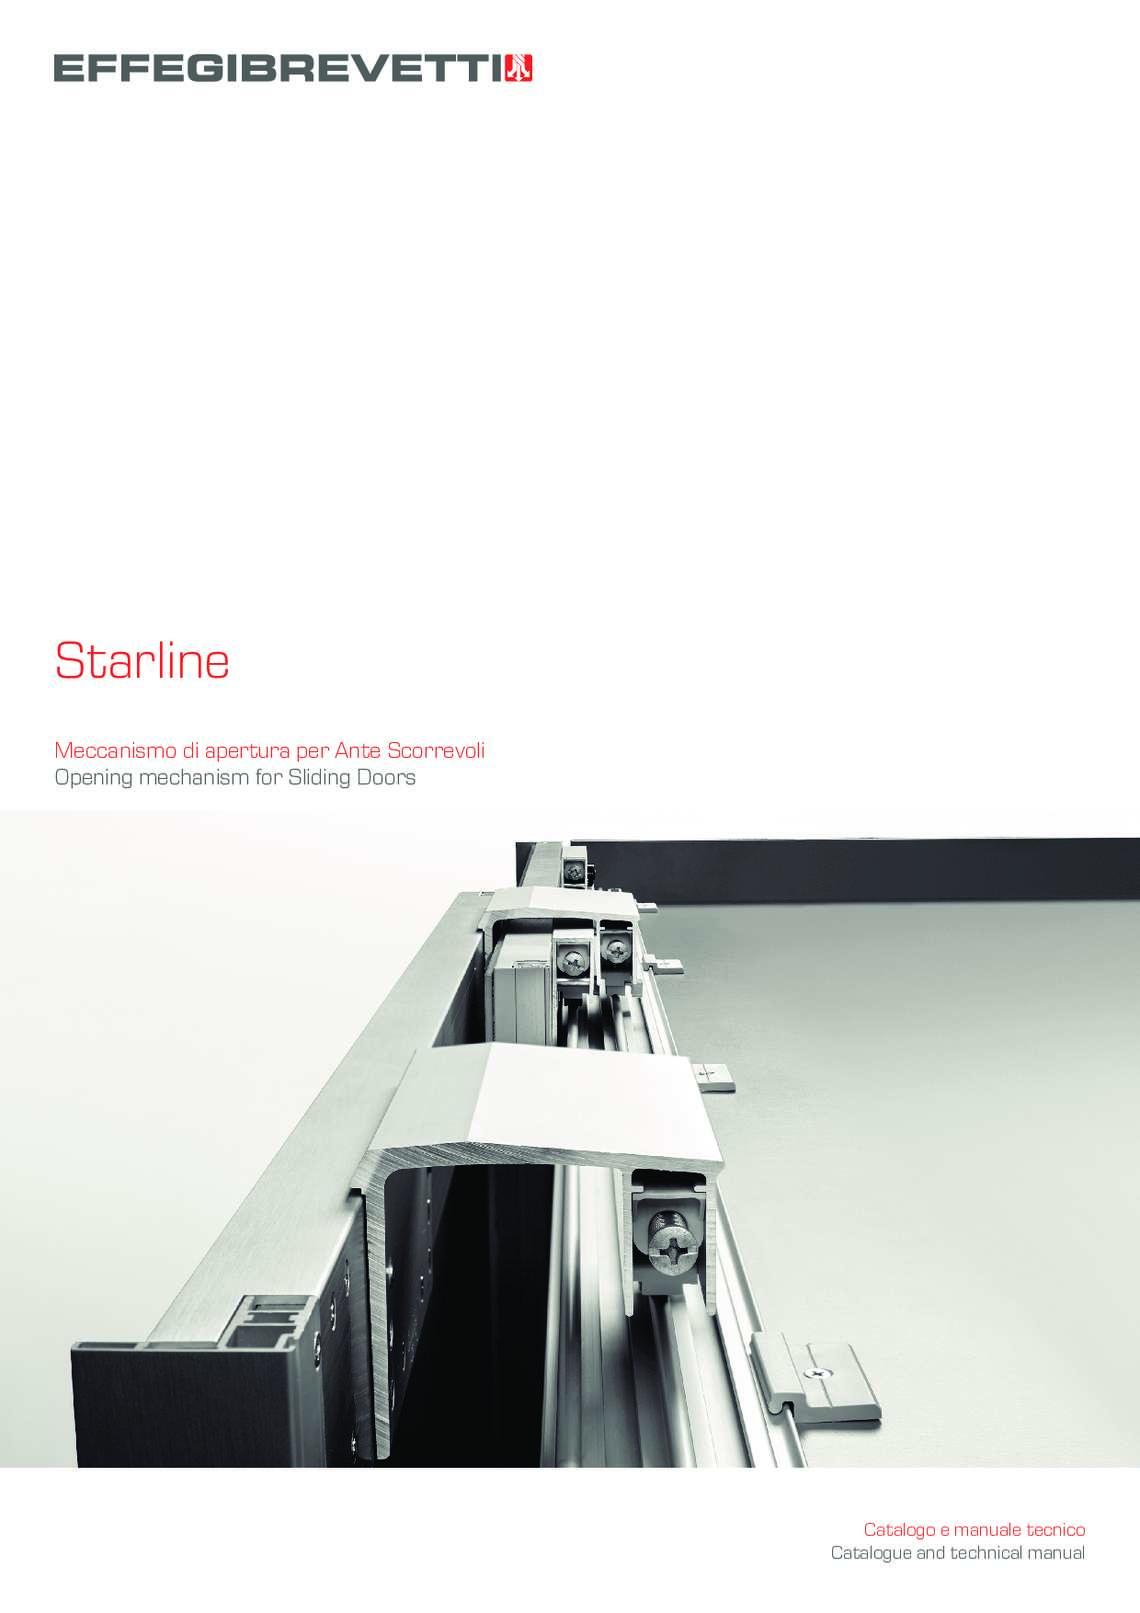 Starline - Opening mechanism for Sliding Doors